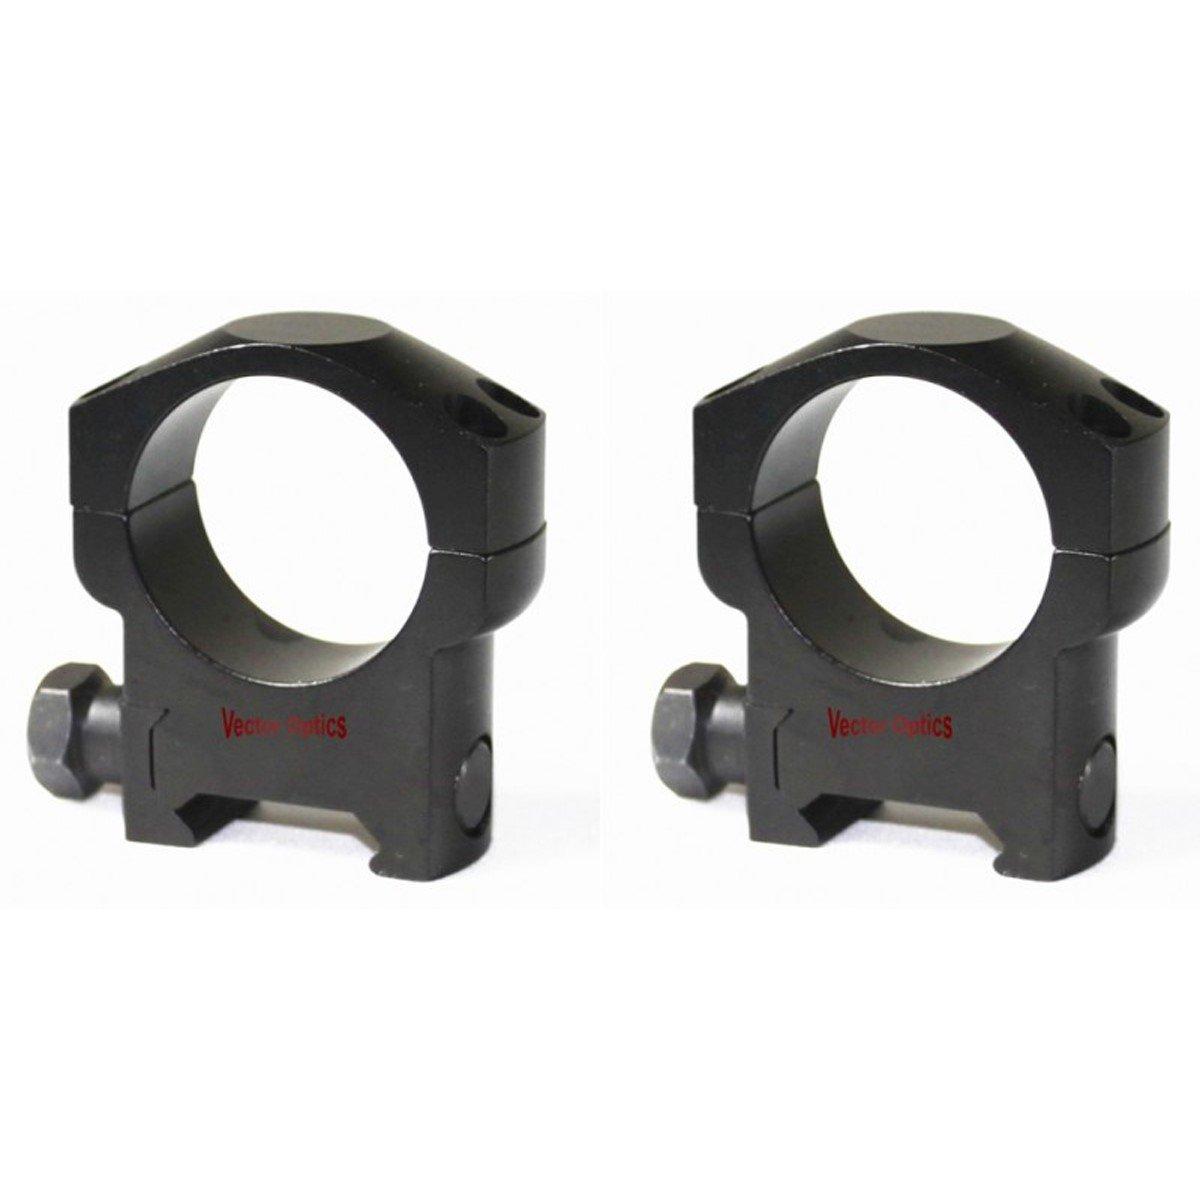 Vector Optics 30mm Medium Mark Weaver Mount Rings(SCTM-22)